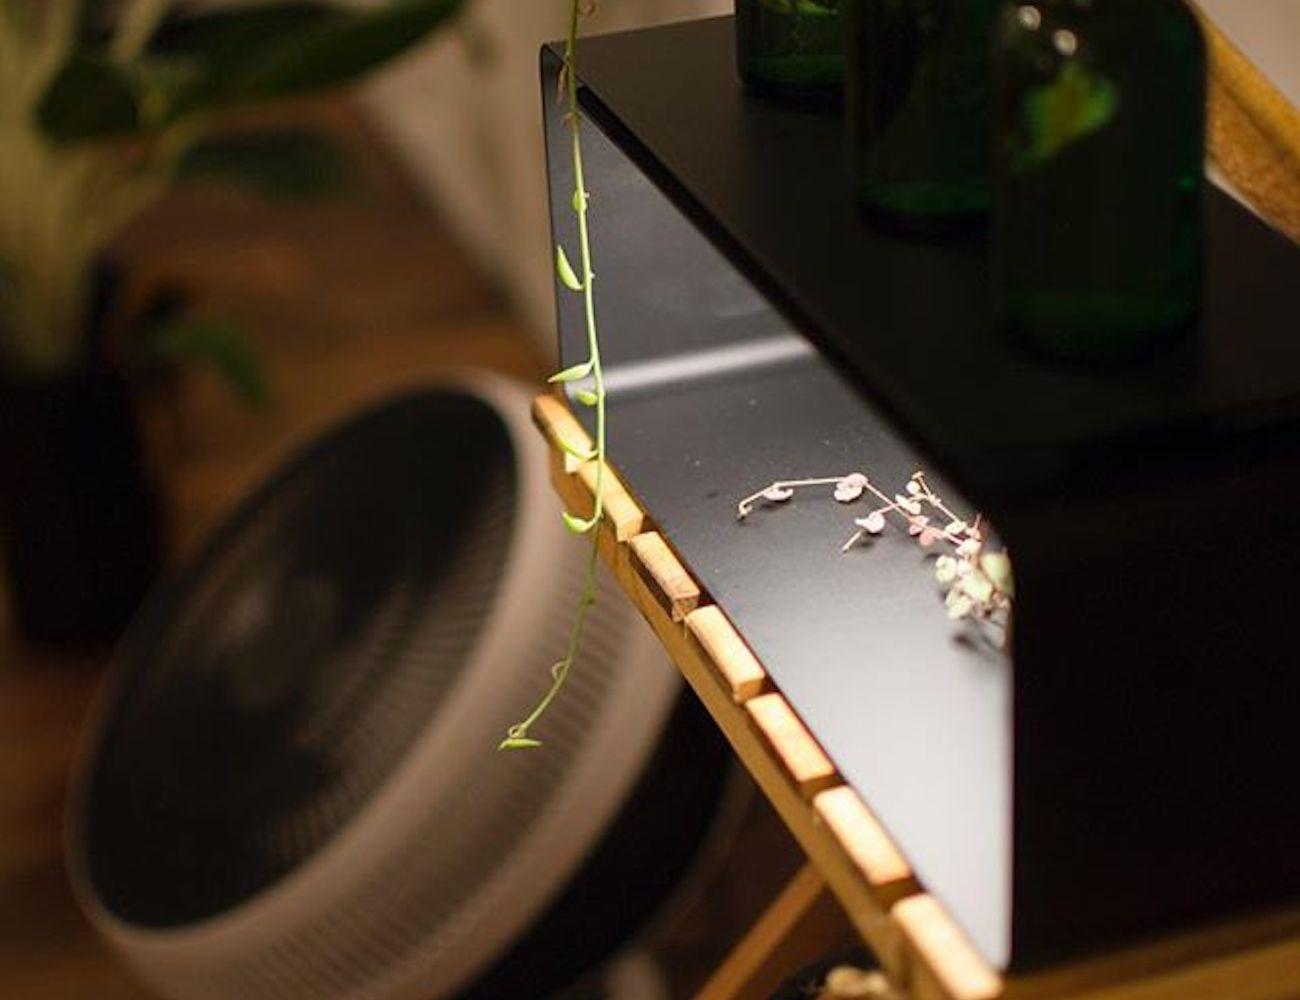 Y.S.M Minimal Lighting Shelf shines over your belongings